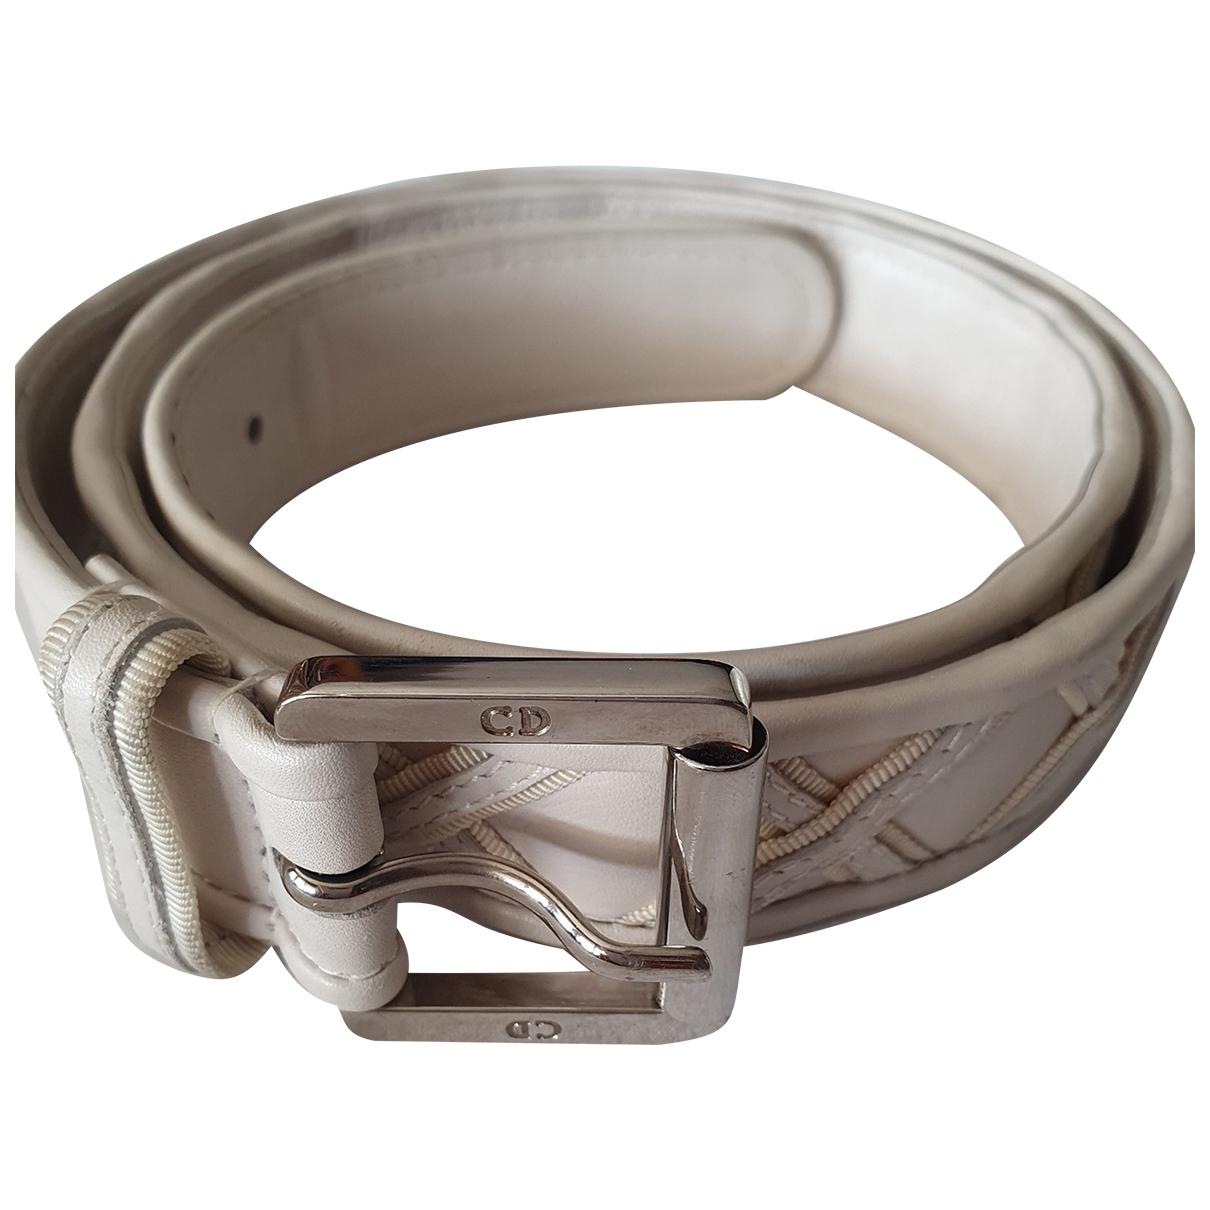 Dior \N Leather belt for Women 85 cm